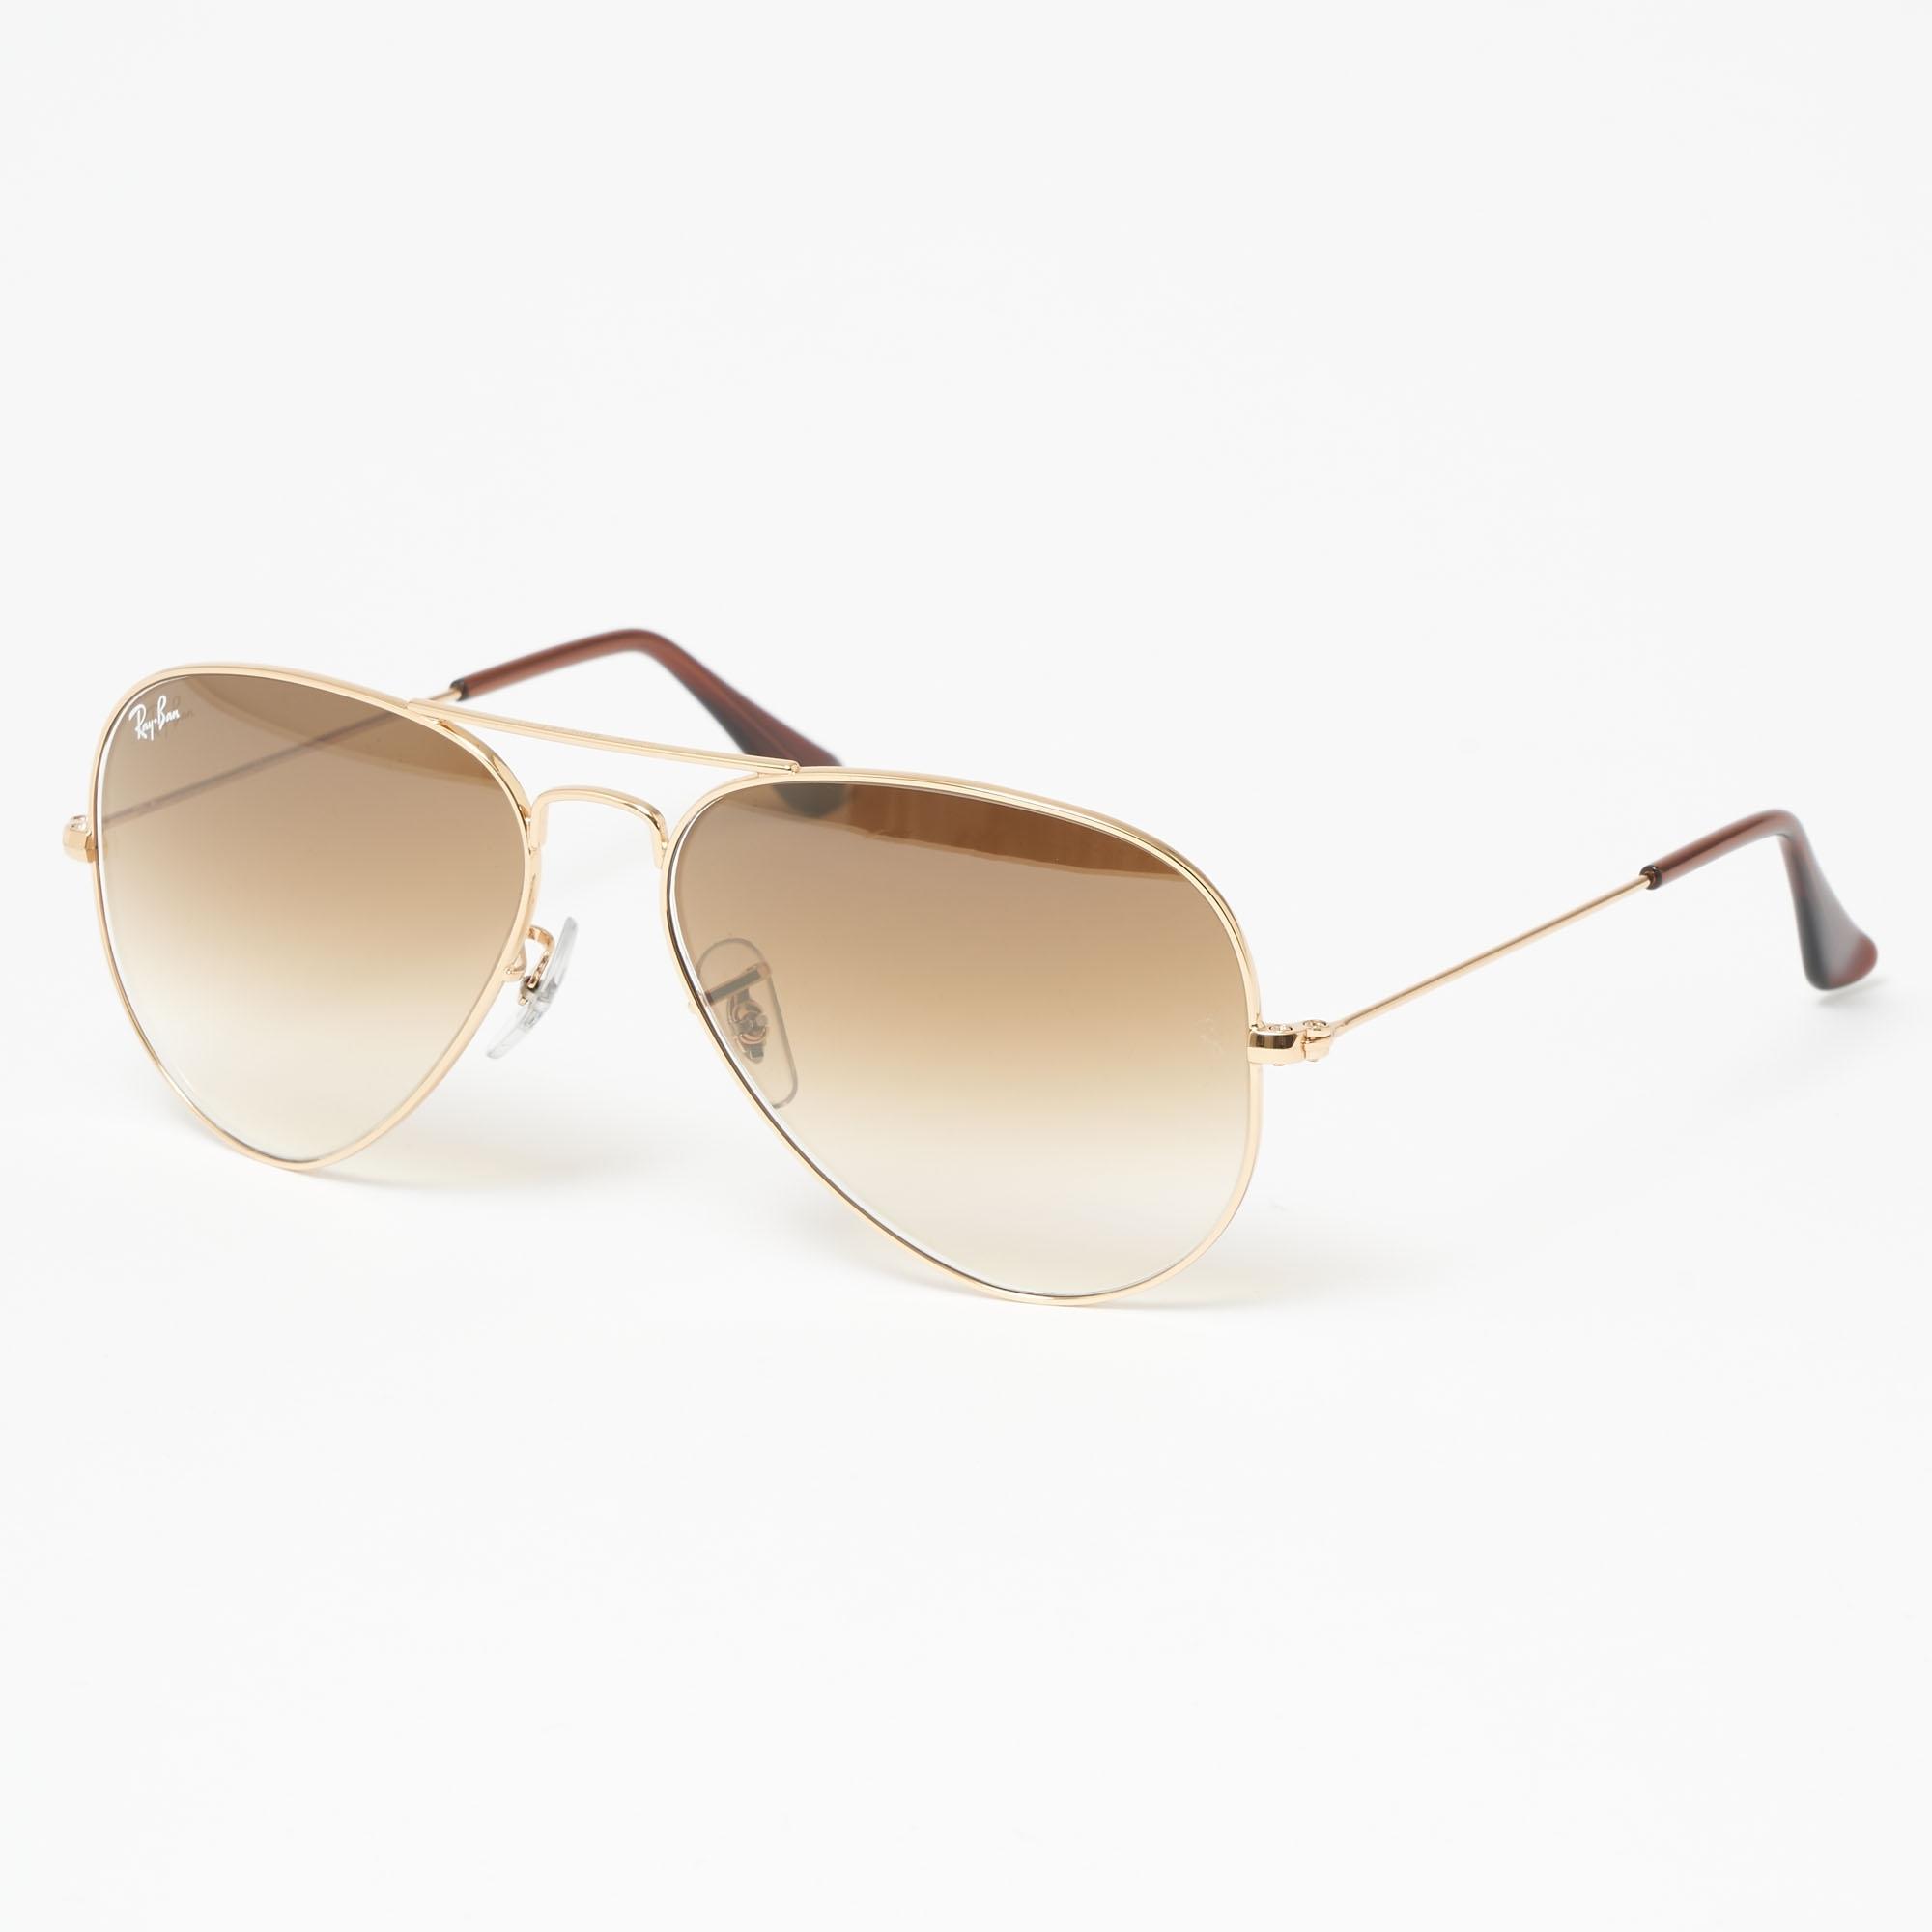 0975888f0726 Gold Aviator Gradient Sunglasses - Light Brown Gradient Lenses